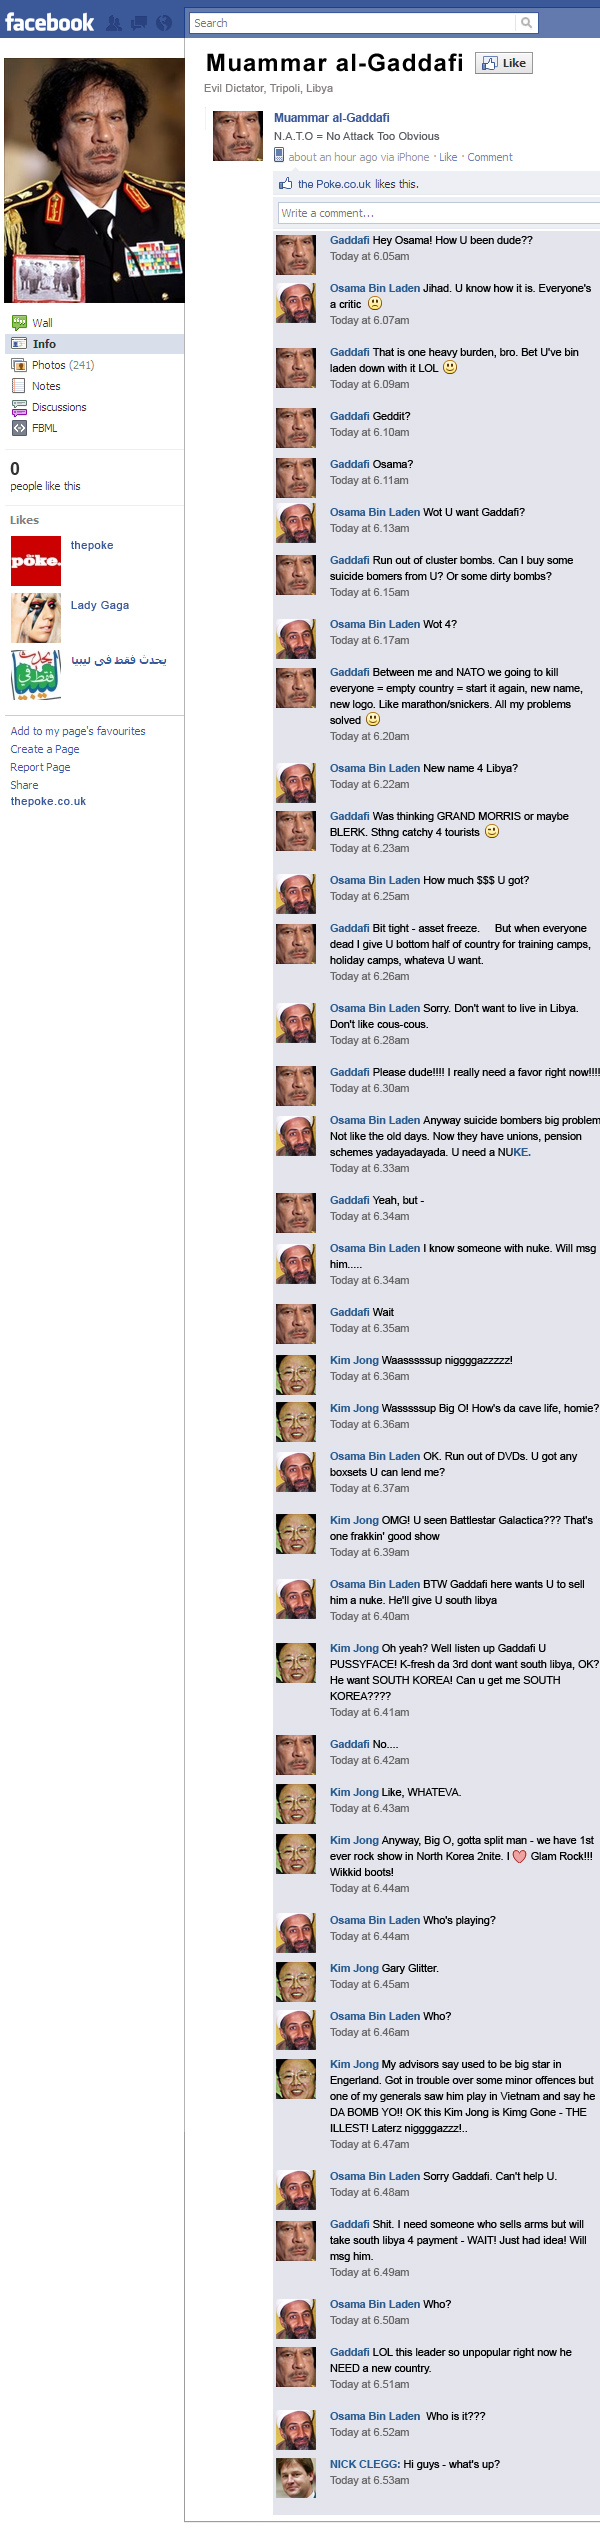 gaddafi's facebook page